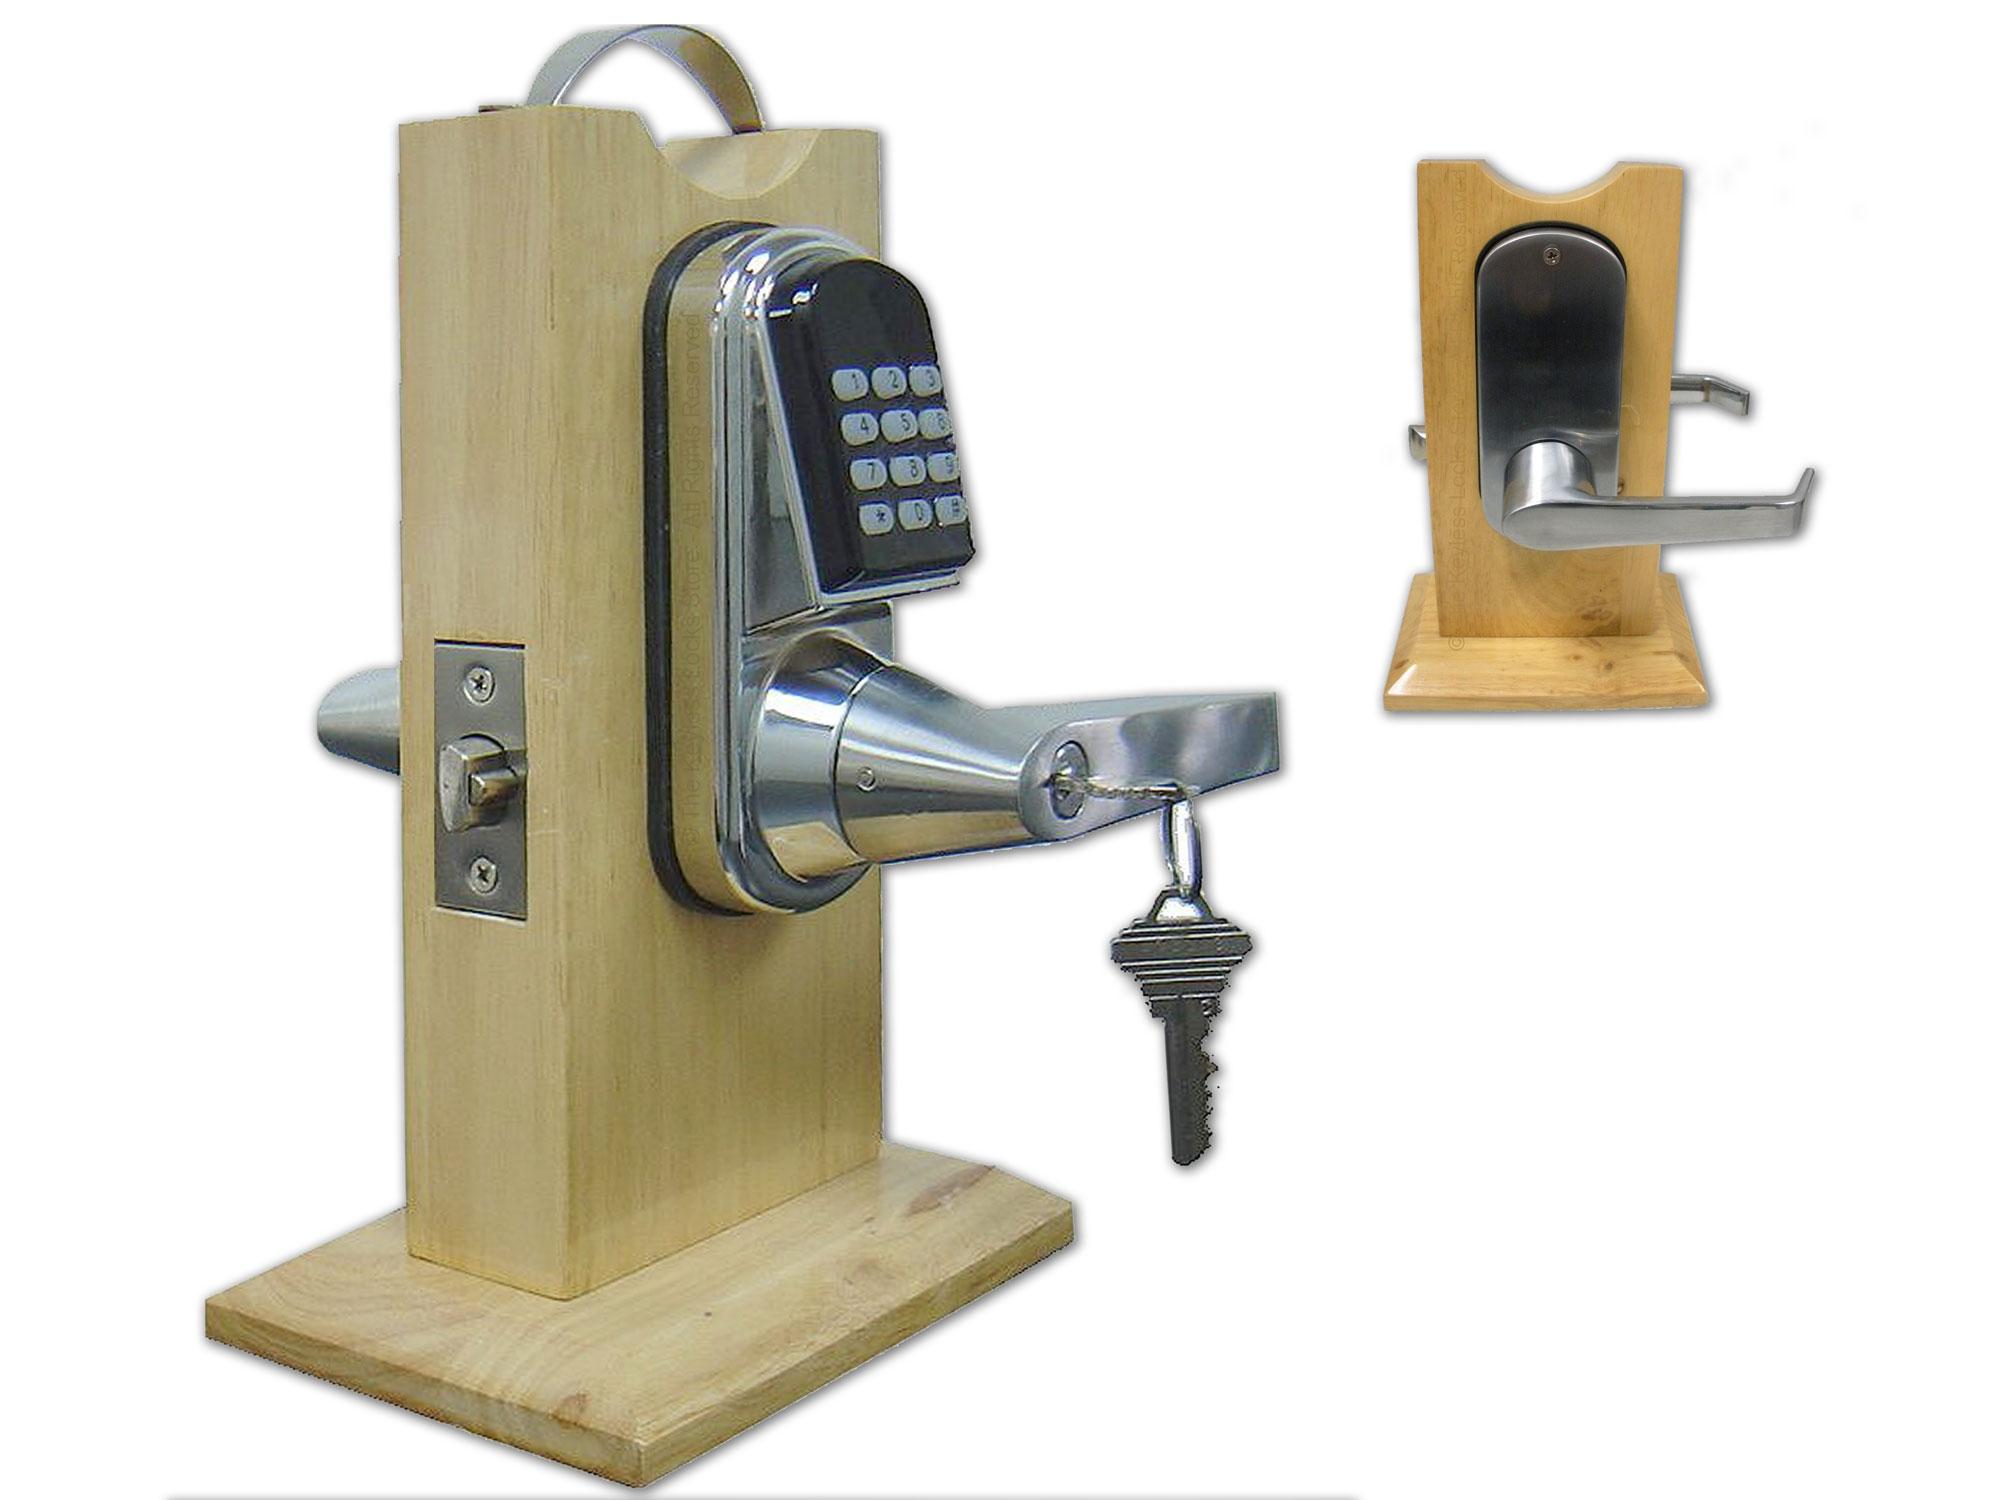 11 Installation And Documentation Keyless Entry Locks Keypad Electronic Security Door Key Circuit Diagram Instructions Eternity E5rf Proximity Card Lock